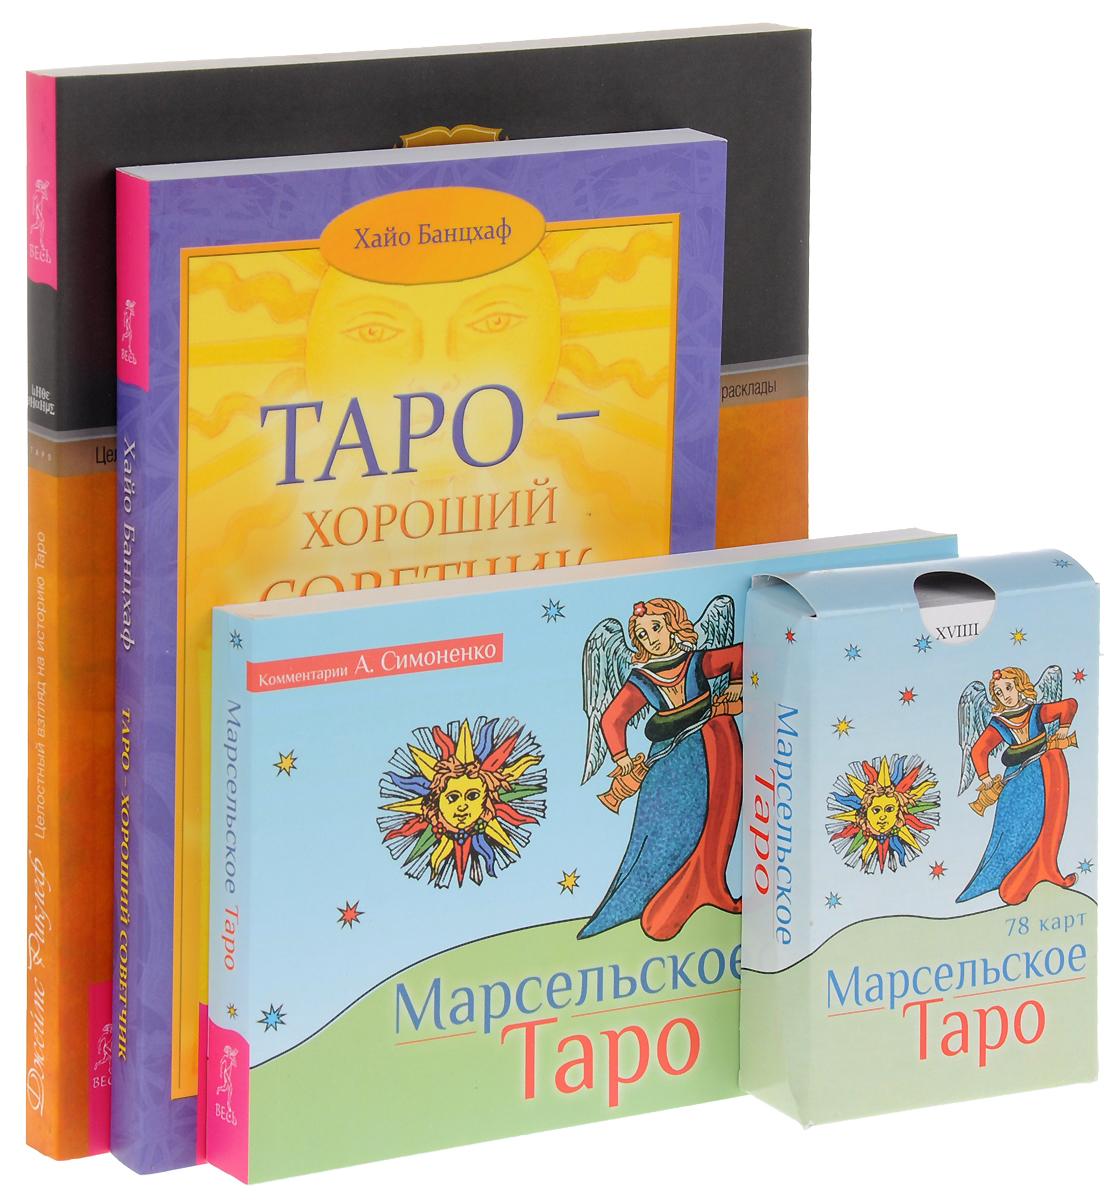 А. Симоненко, Хайо Банцхаф, Джеймс Риклеф Марсельское Таро. Таро – хороший советчик. Целостный взгляд на историю Таро (комплект из 3 книг + 78 карт)